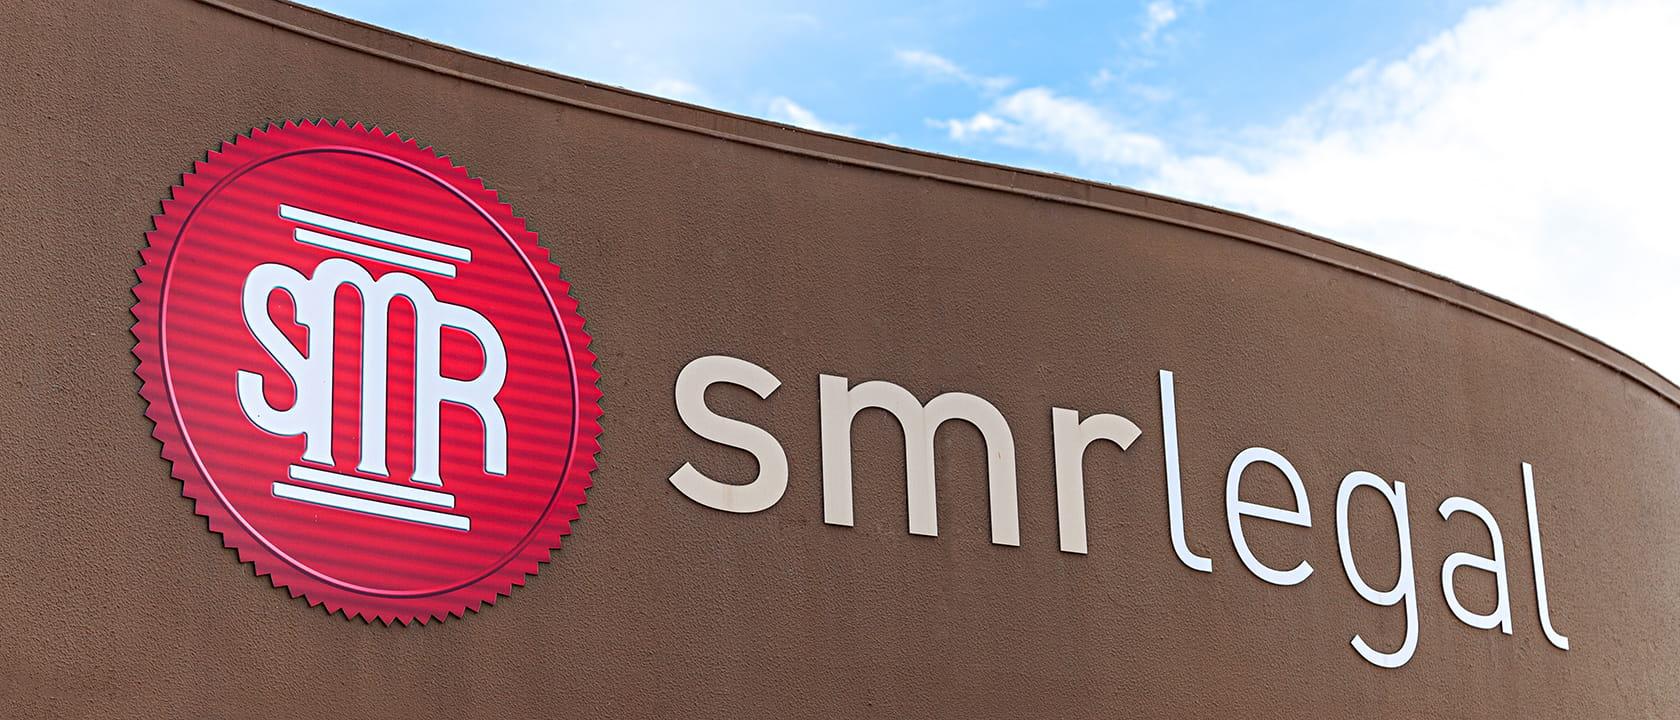 SMR Legal Shepparton and Melbourne